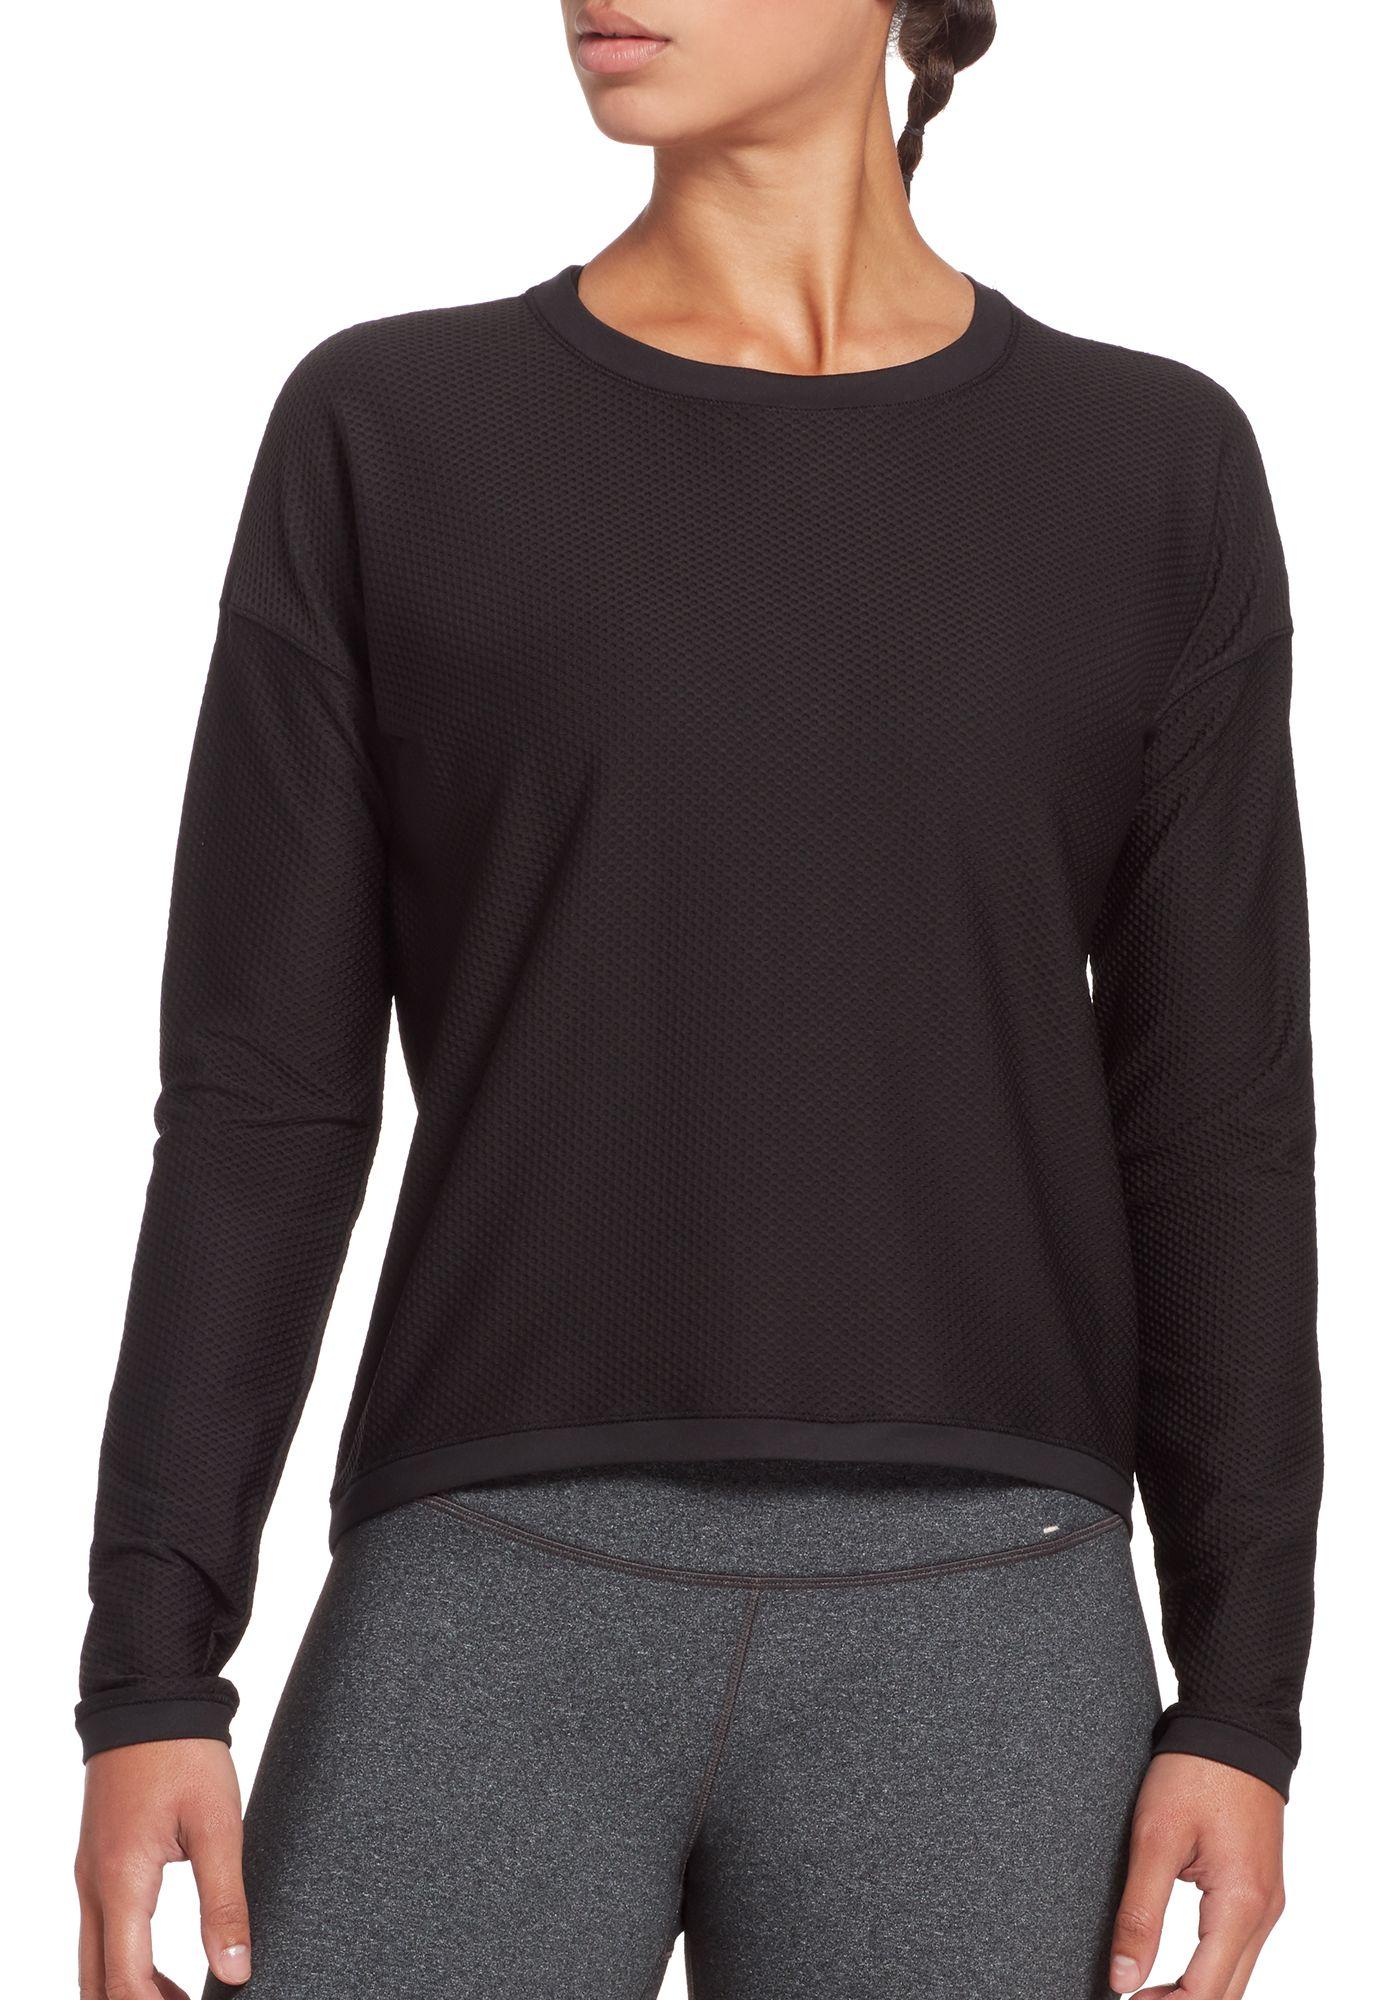 CALIA by Carrie Underwood Women's Move Mesh Long Sleeve Shirt